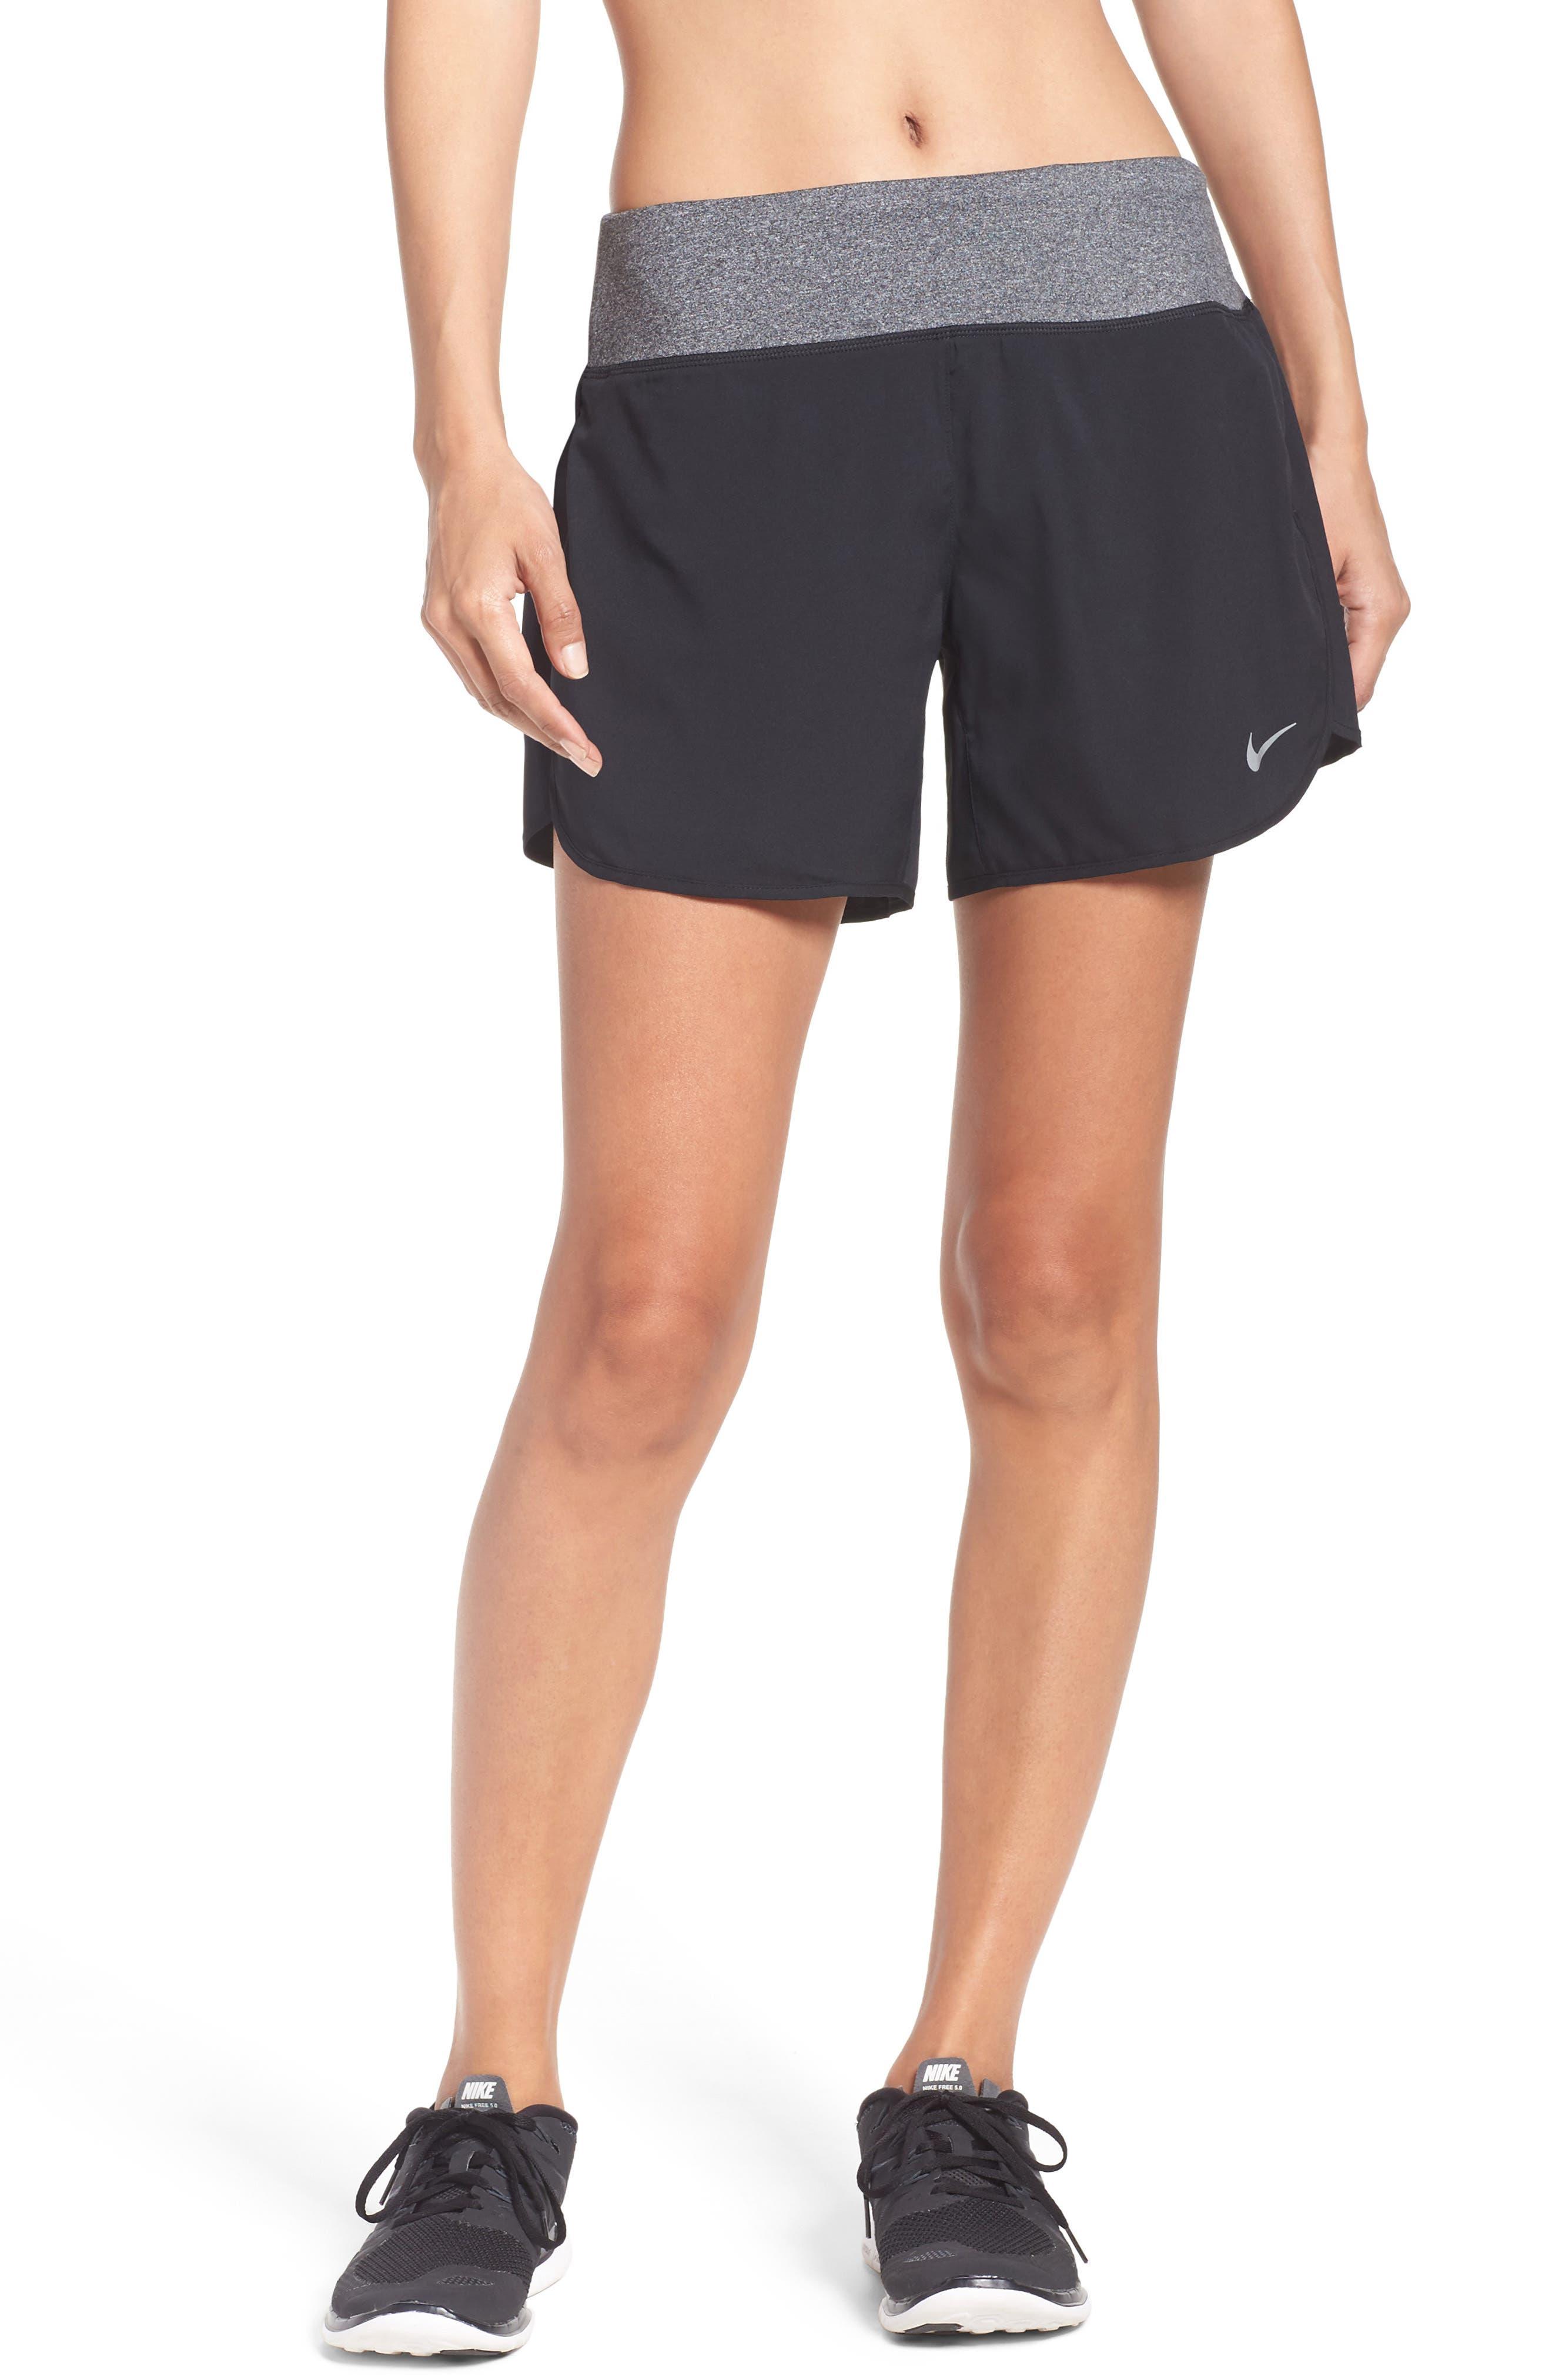 Flex Running Shorts,                             Main thumbnail 1, color,                             Black